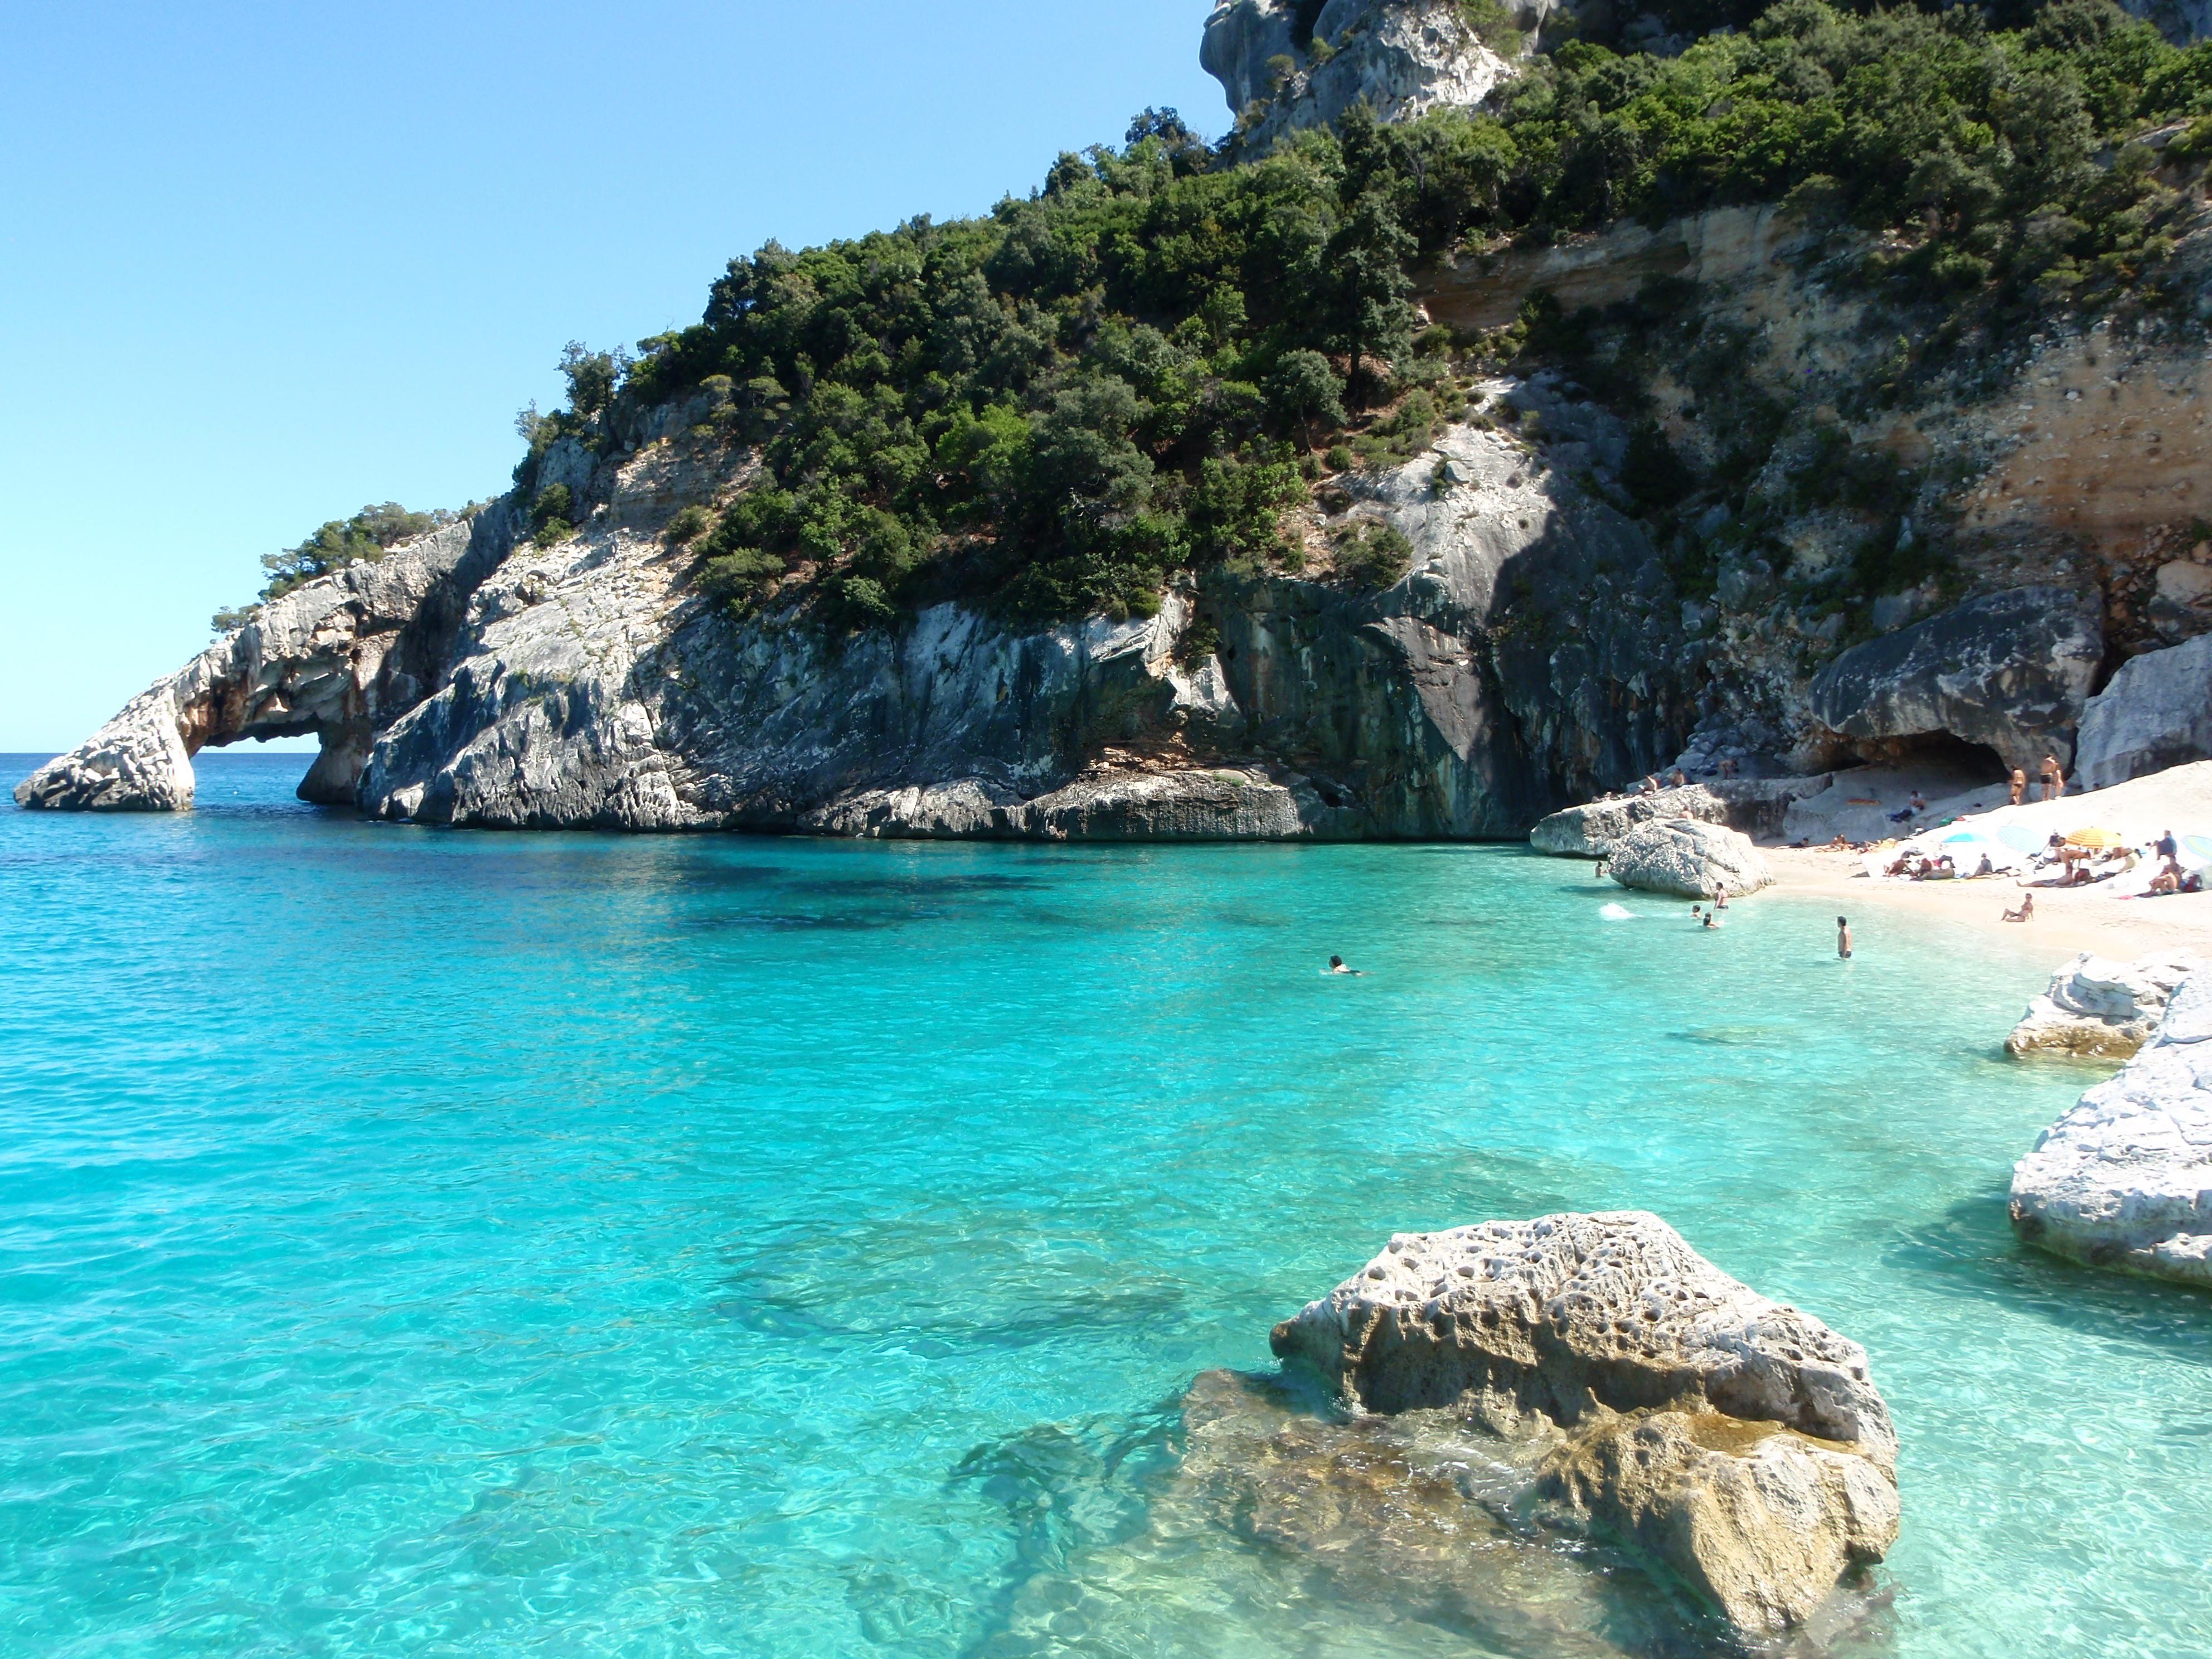 Cala Goloritzé (Sardinia, Italy)